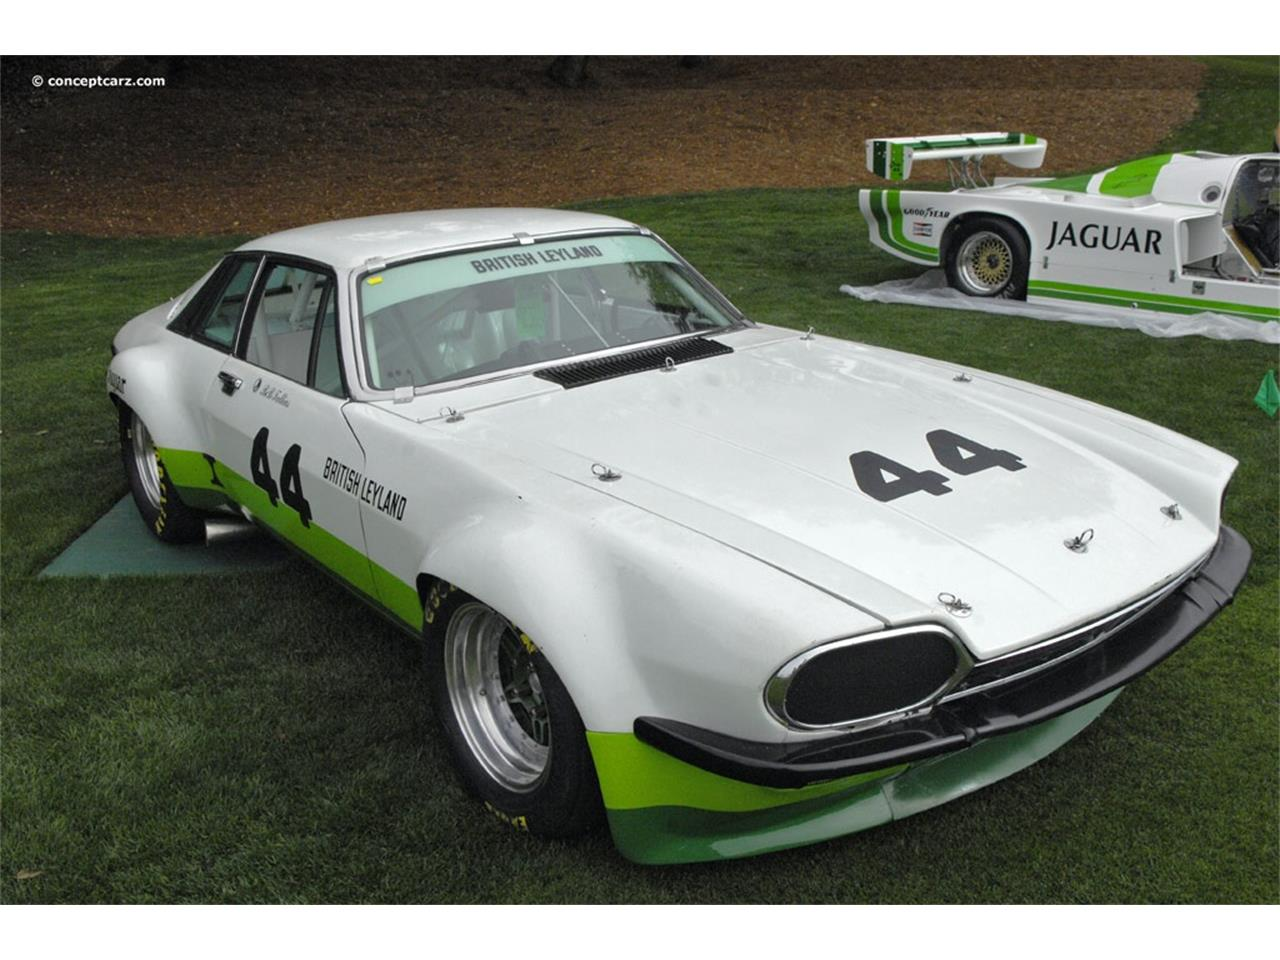 1983 Jaguar XJS (CC-1189910) for sale in Carnation, Washington